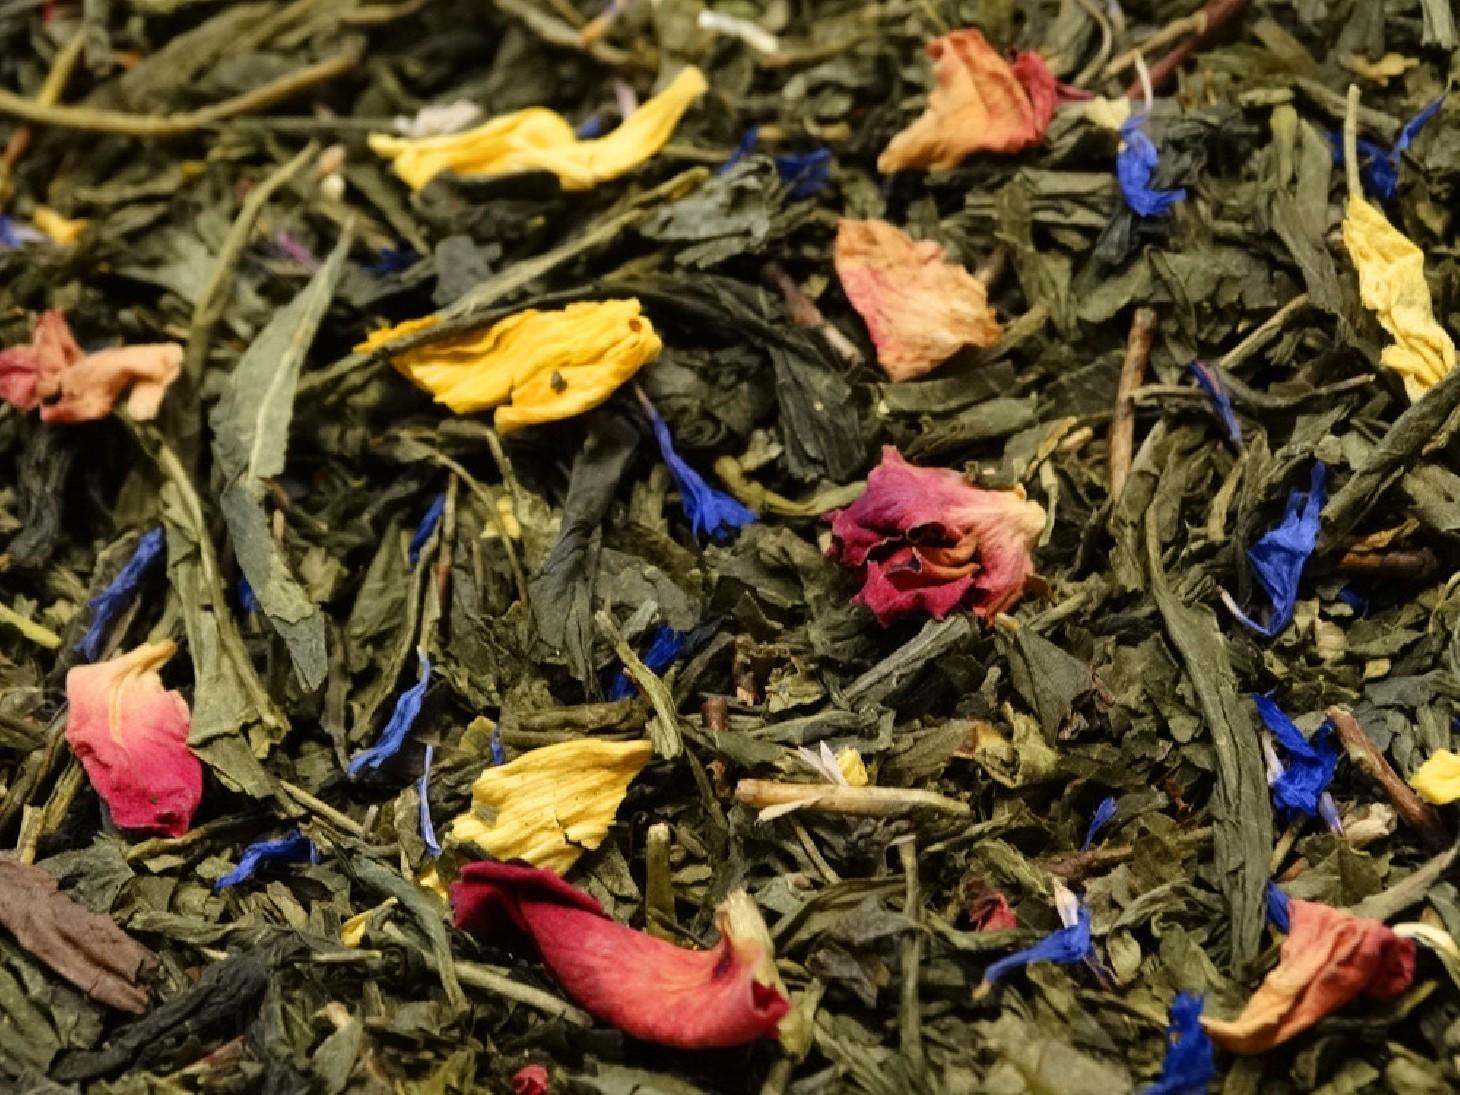 thé vert aromatisé à la mangue mange mambo par tea & cie www.teacie.com